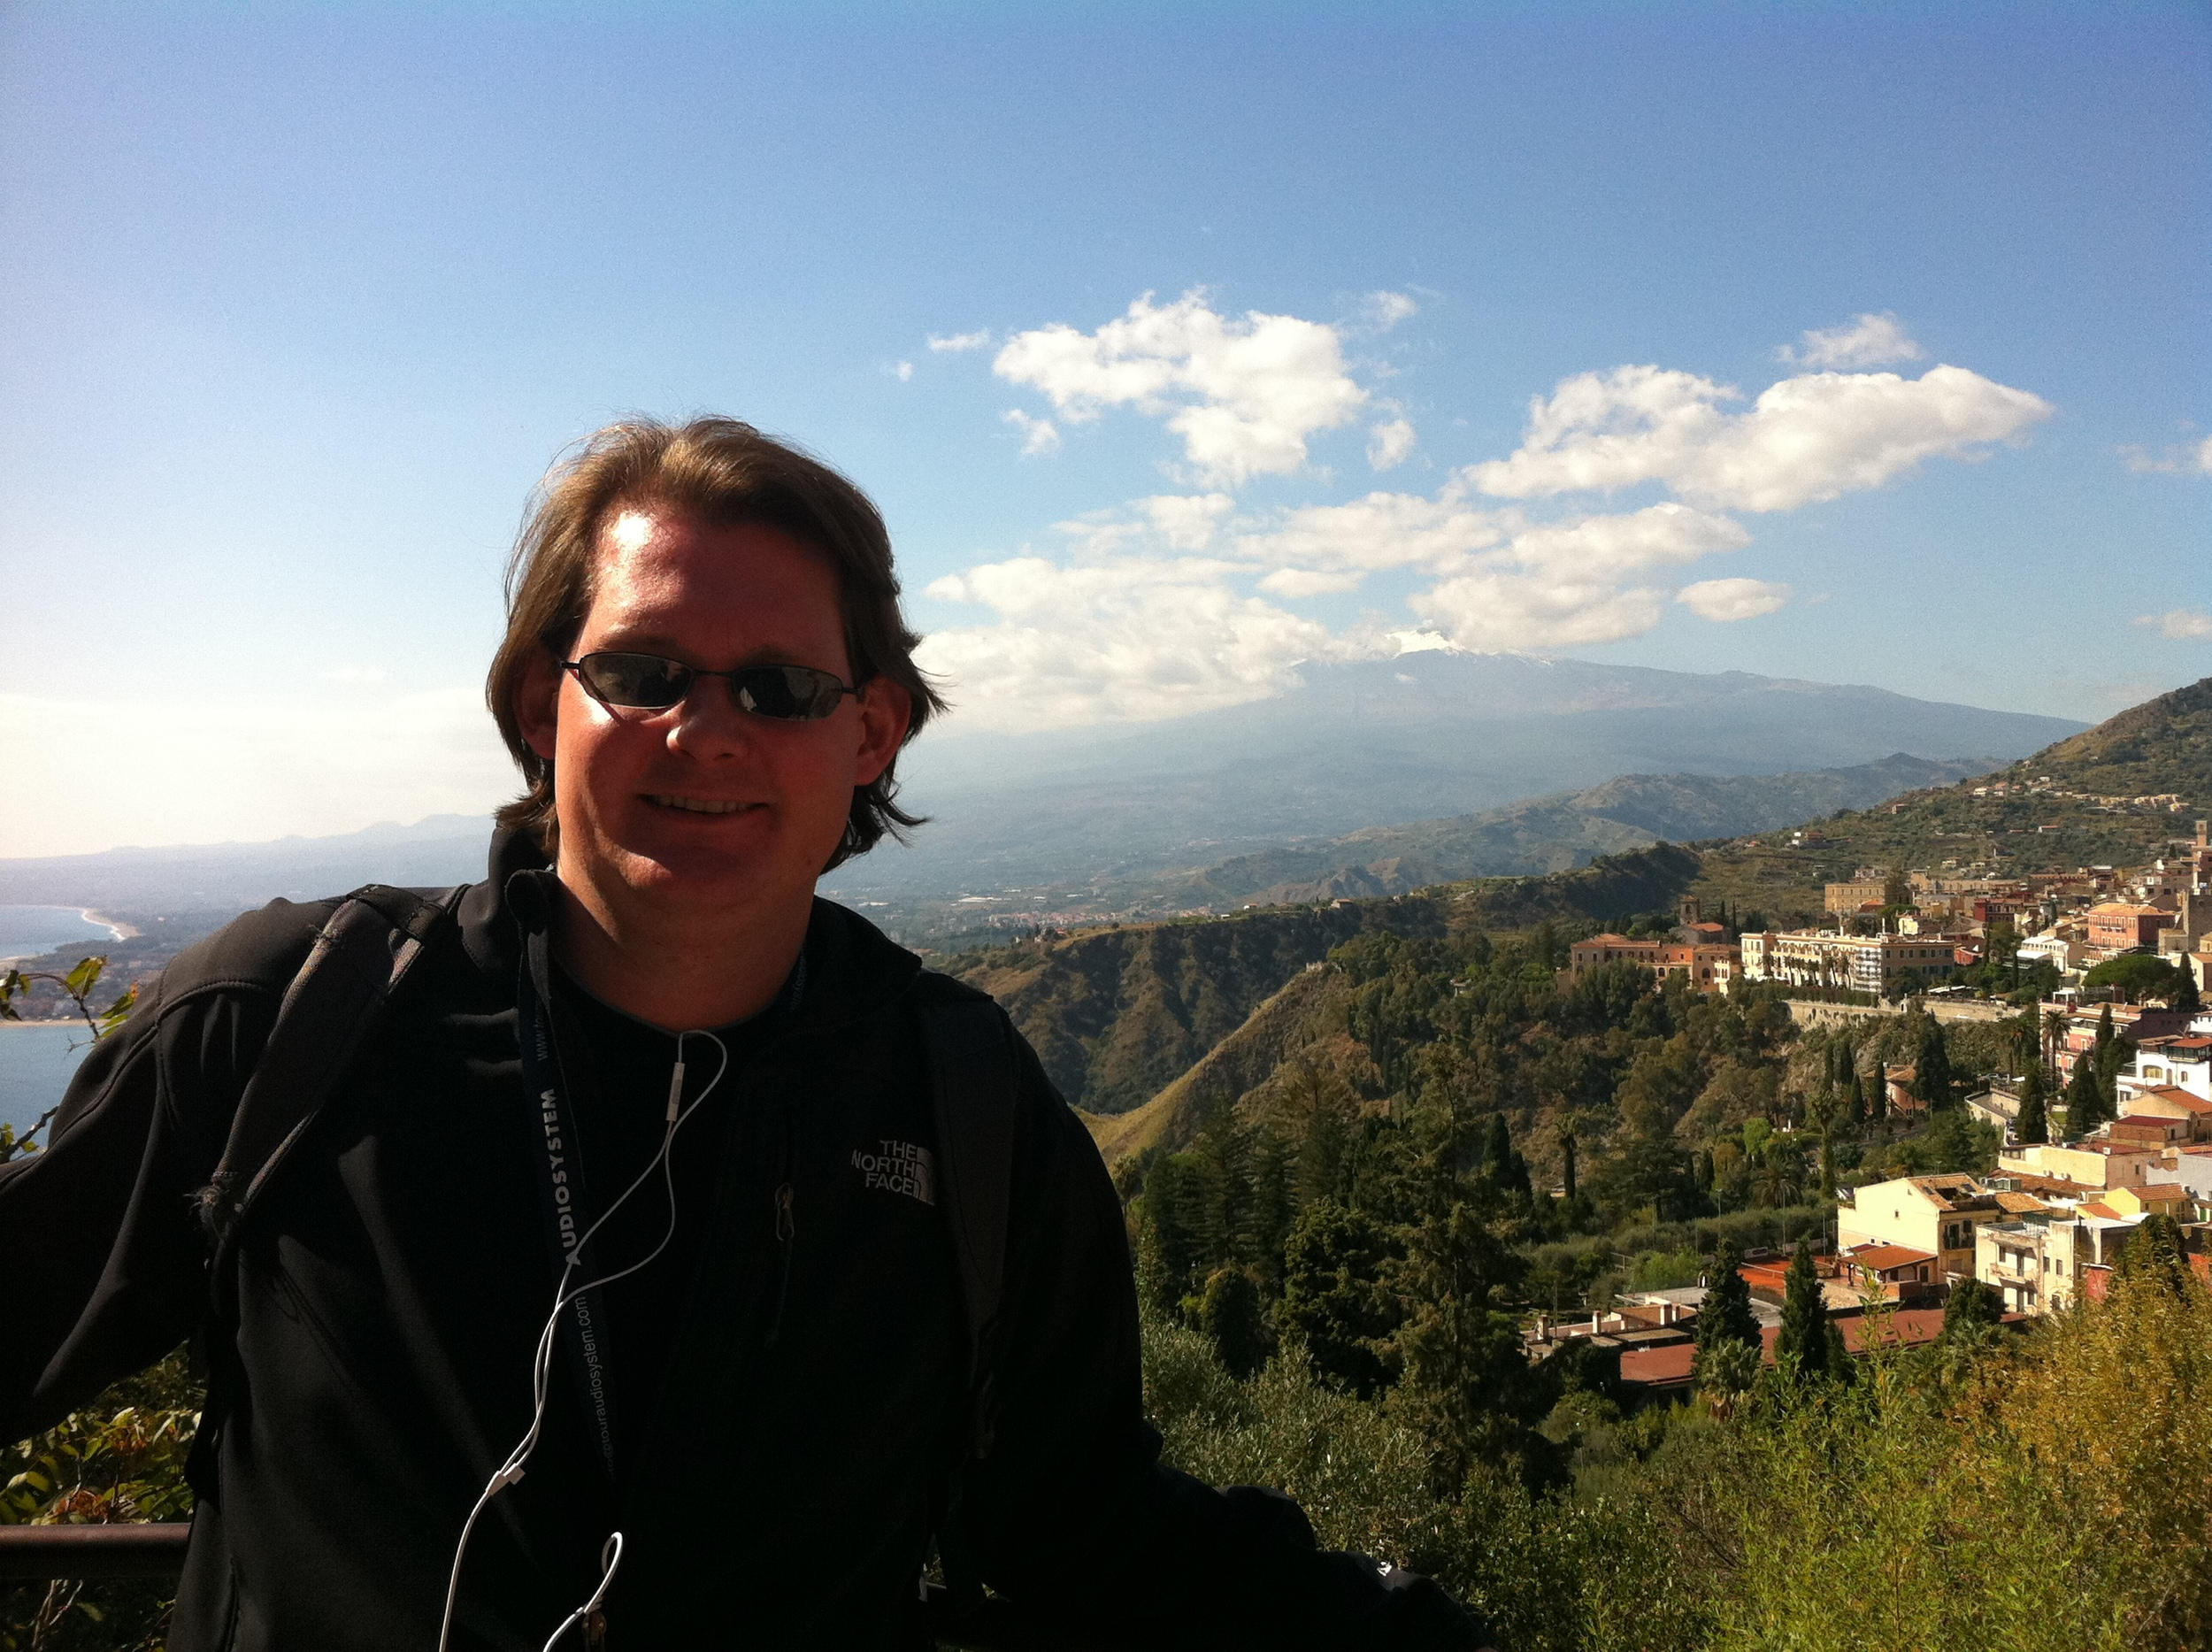 Robert at Mt Etna AiB Mediterreanean Cruise Oct 11.JPG